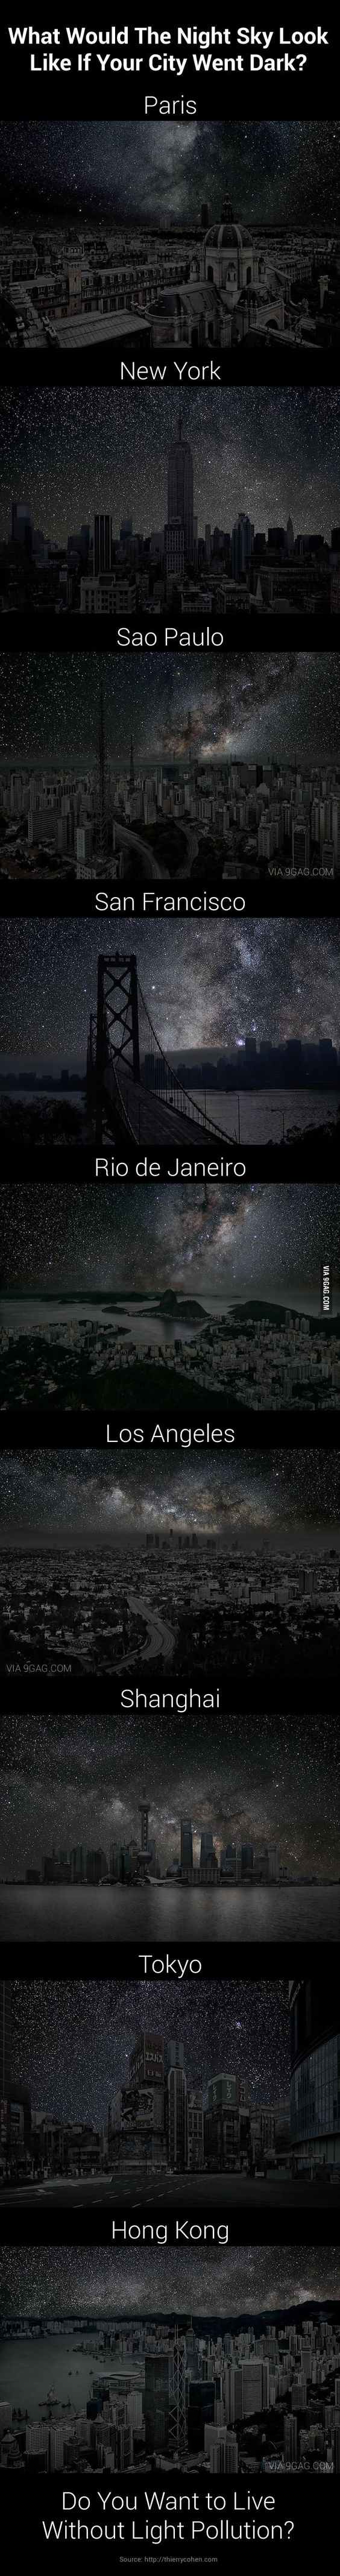 9 Amazing Night Sky of 9 Darkened Cities by thierrycohen via 9gag #Night_Sky #Light_Pollution